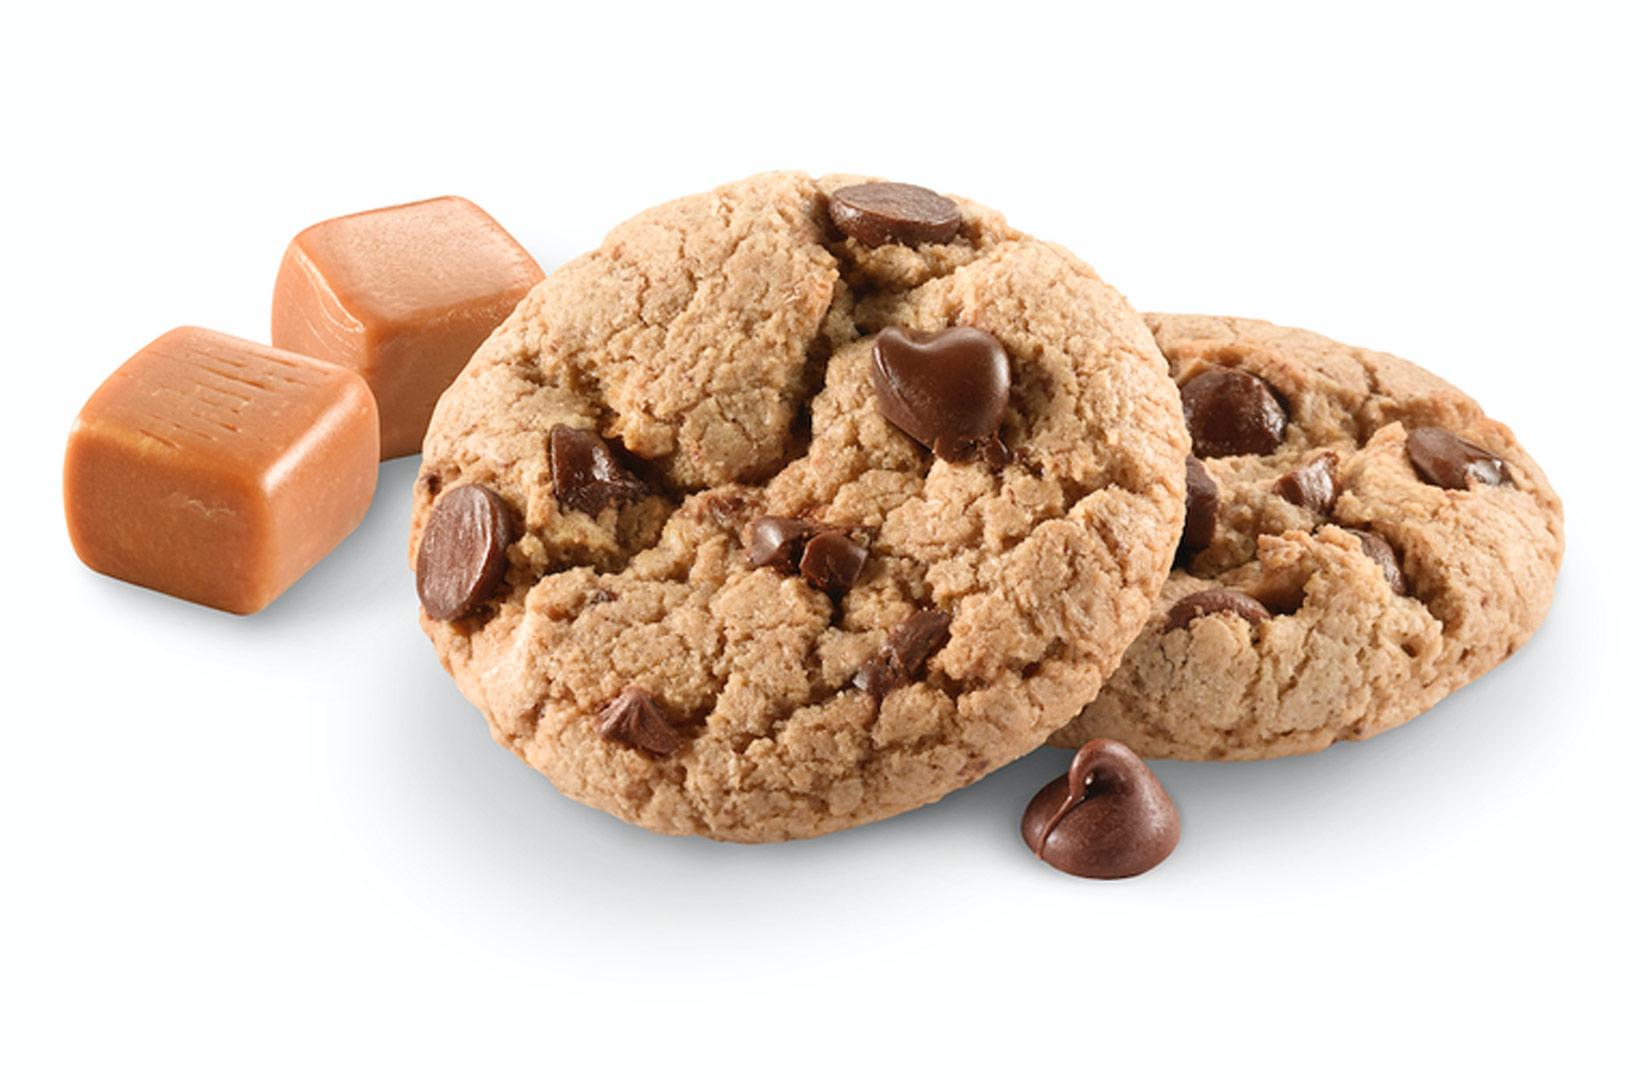 2018-08-14-Girl-Scouts-Gluten-Free-Caramel-Chocolate-Chip-Cookie_1534273906579.jpg